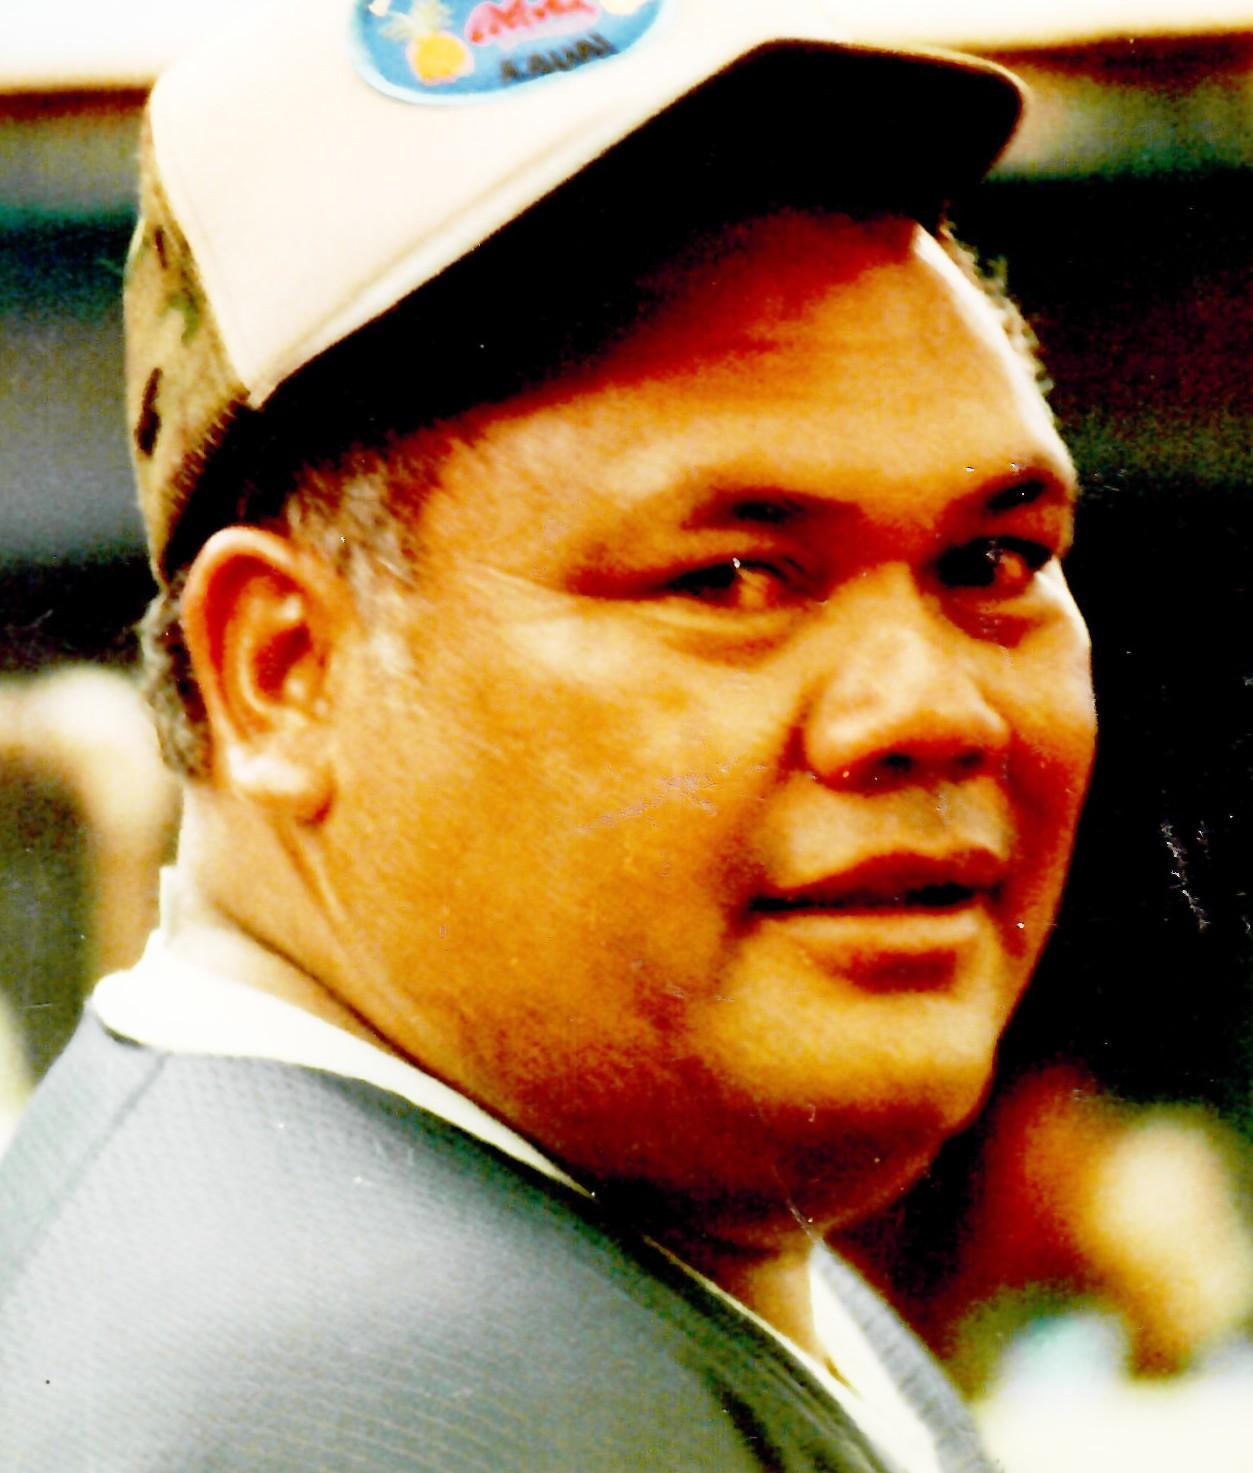 Walter Vernon Kalei Opuu Kealoha Manu Ulaokapaina Kahale Nani Nui Keamo